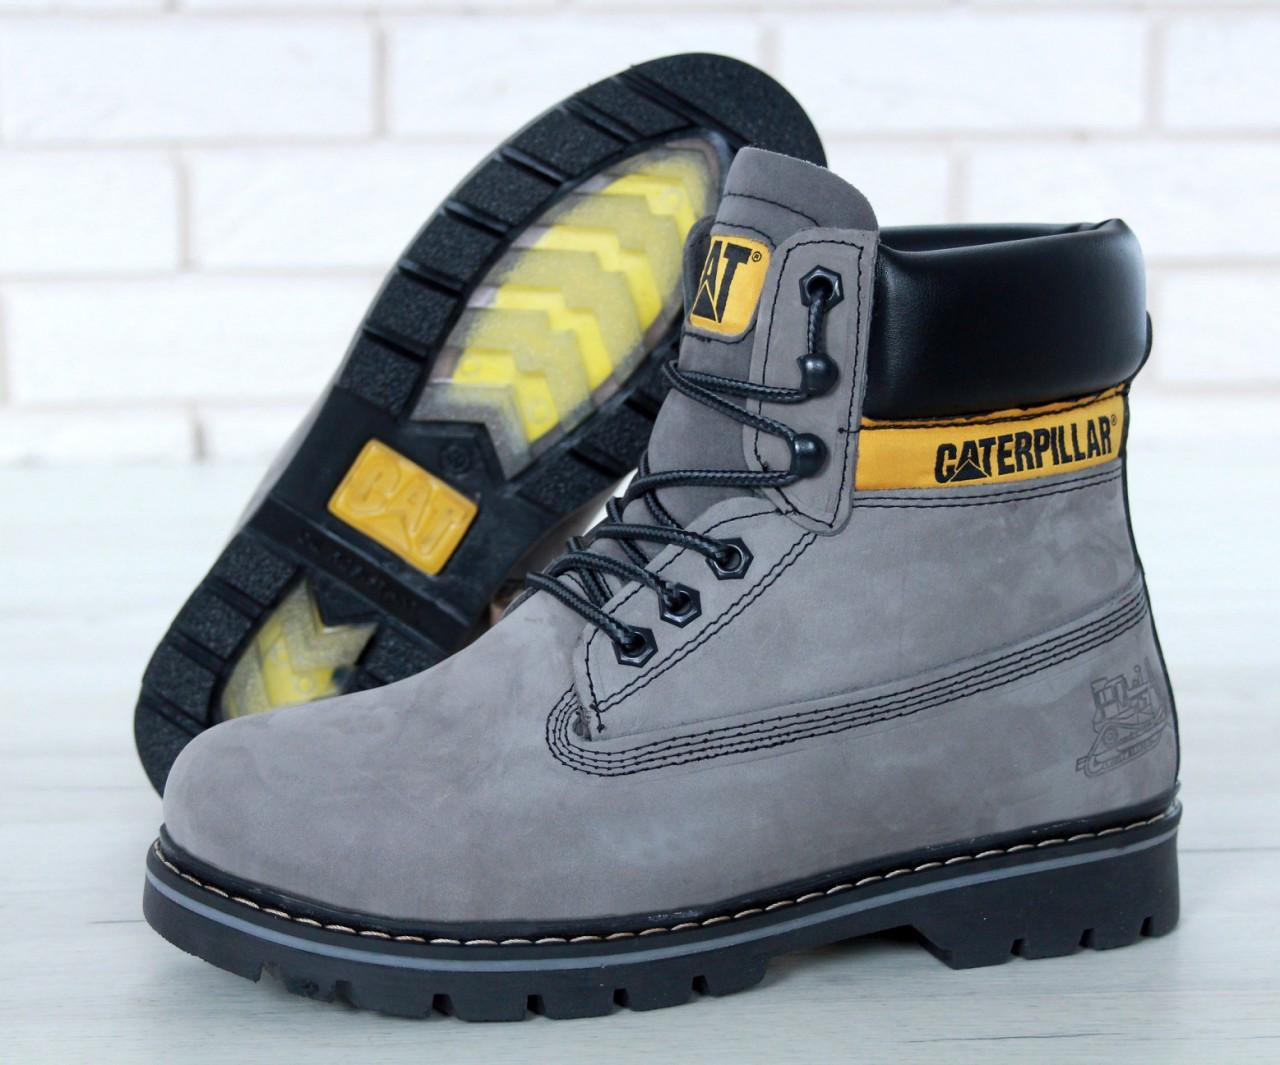 Мужские зимние ботинки Caterpillar Colorado Fur Grey, мужские ботинки. ТОП Реплика ААА класса.